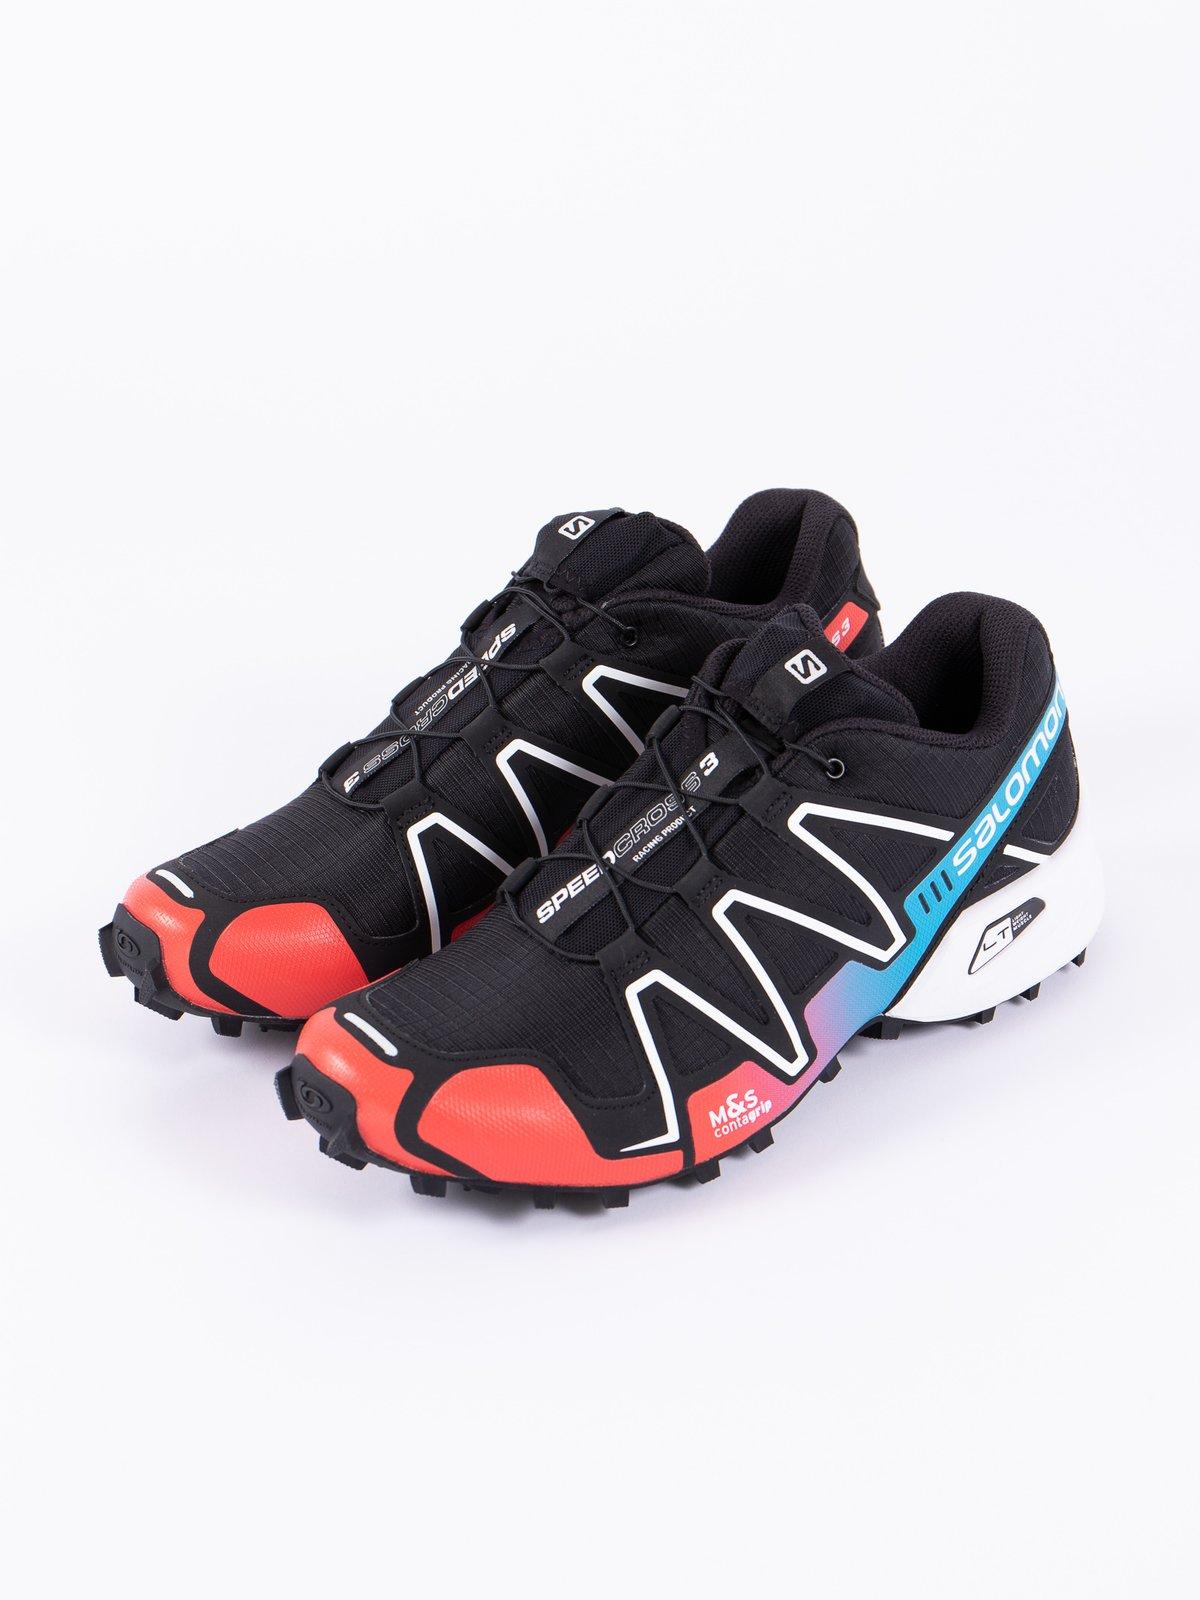 Black/Red/Transcend Blue Speedcross 3 Adv - Image 2